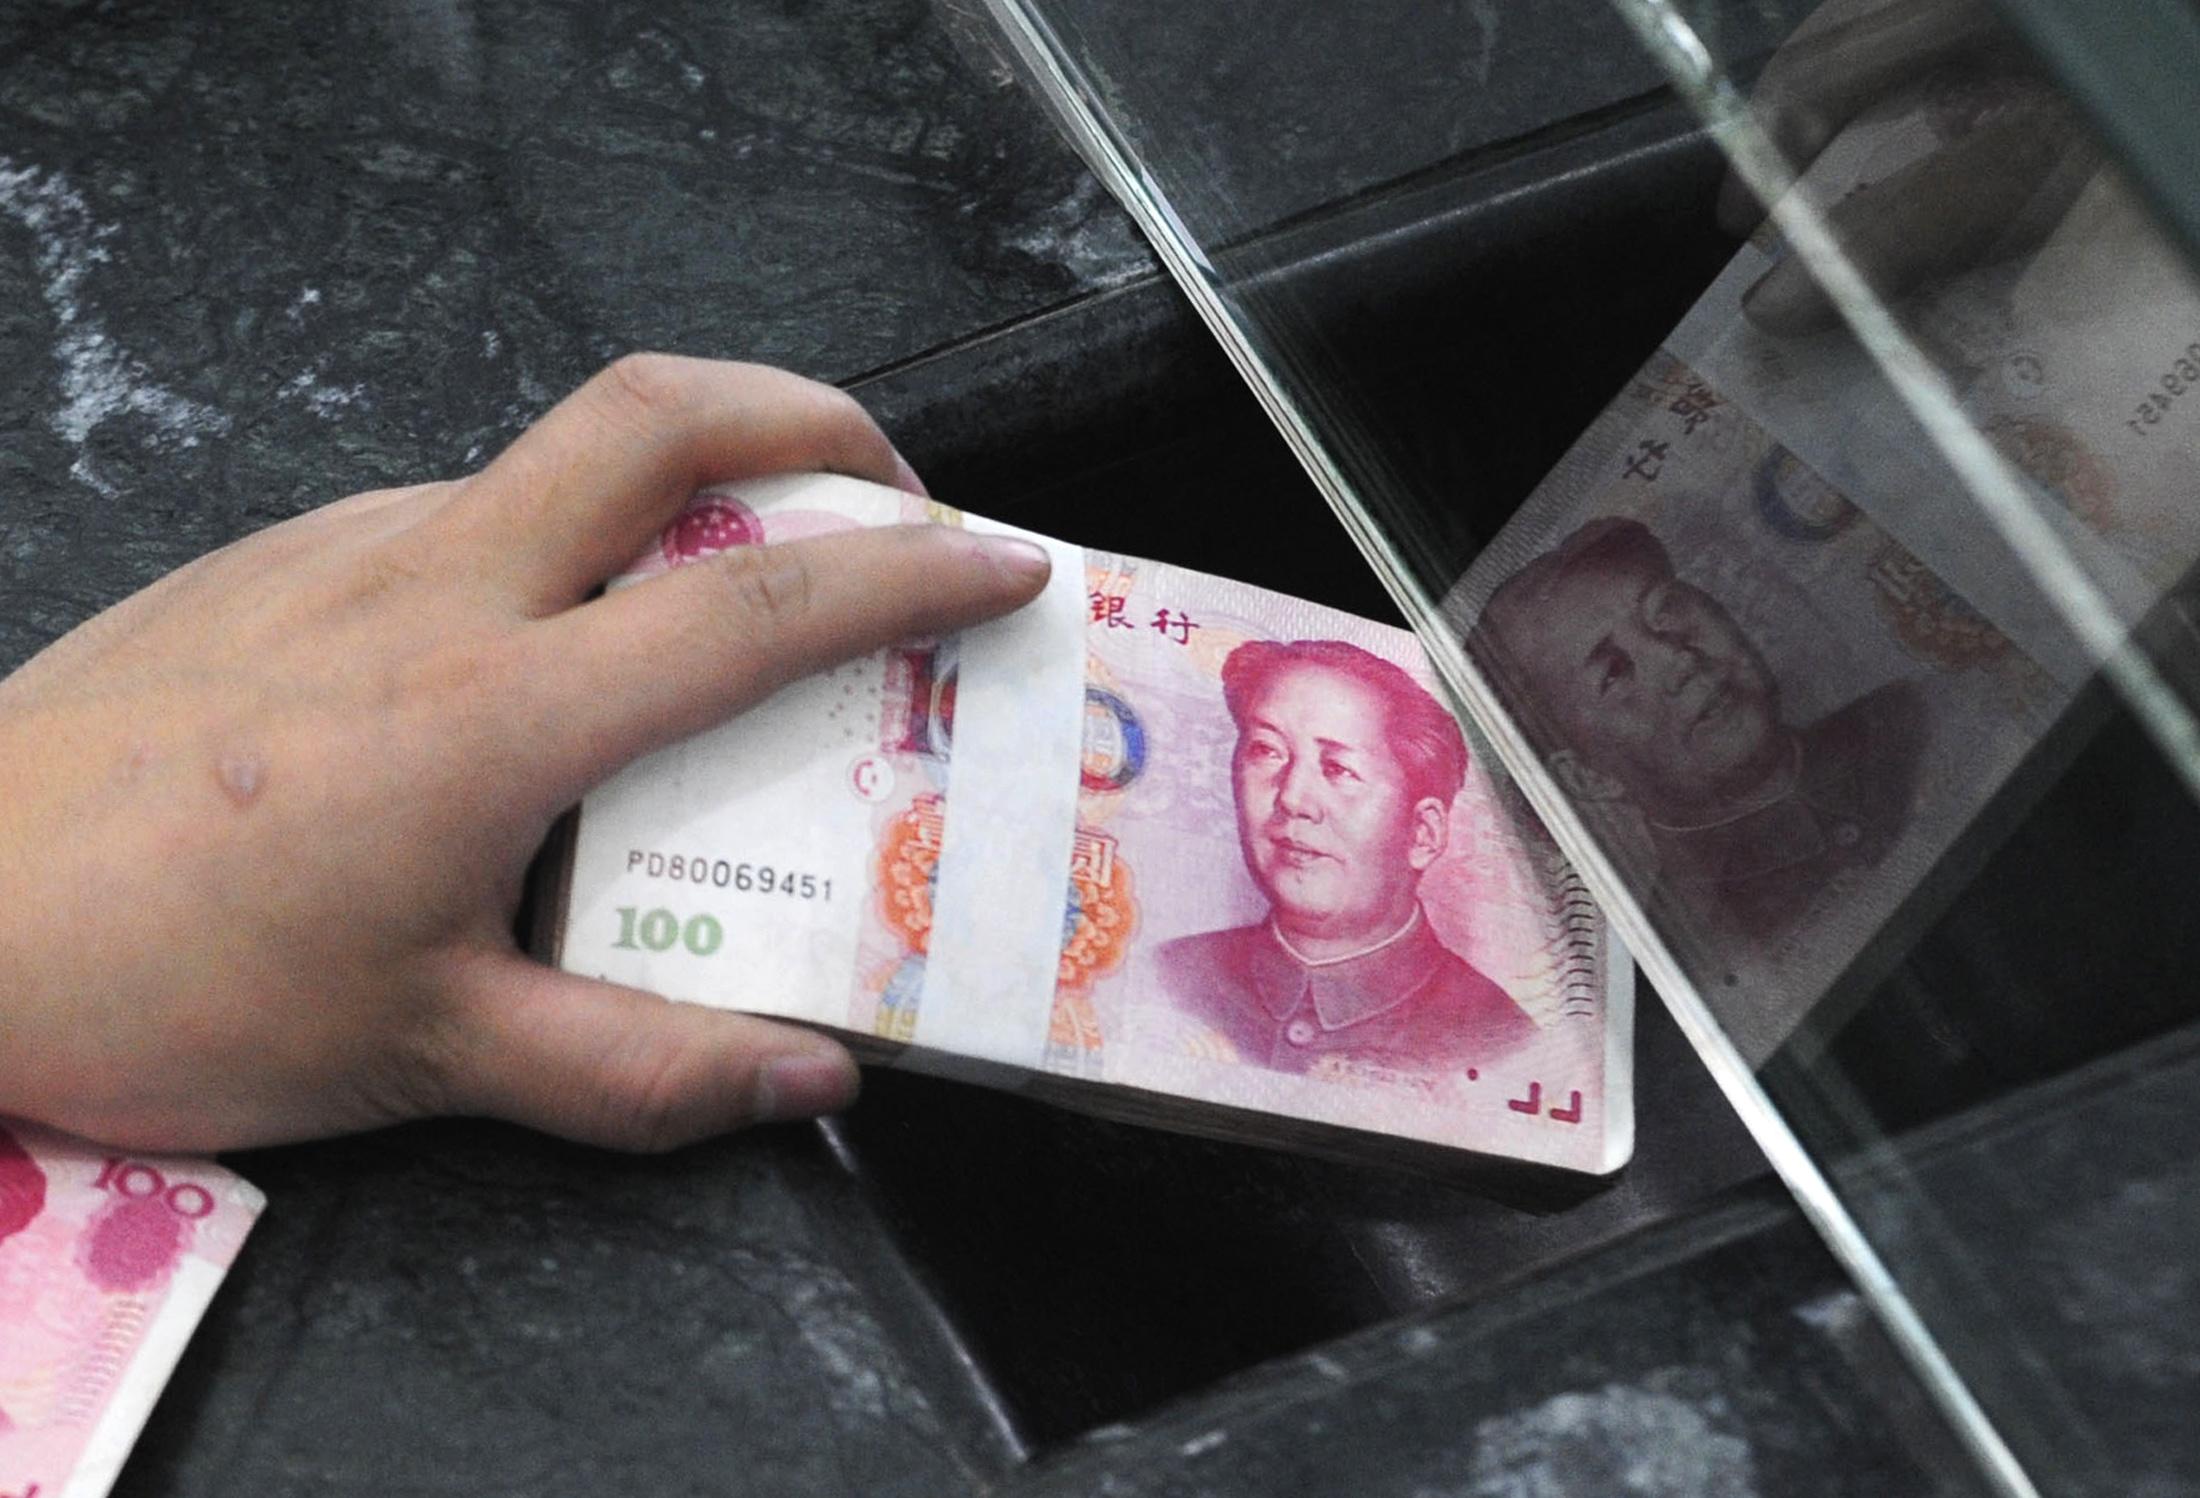 Chinese banks: the metrics don't matter